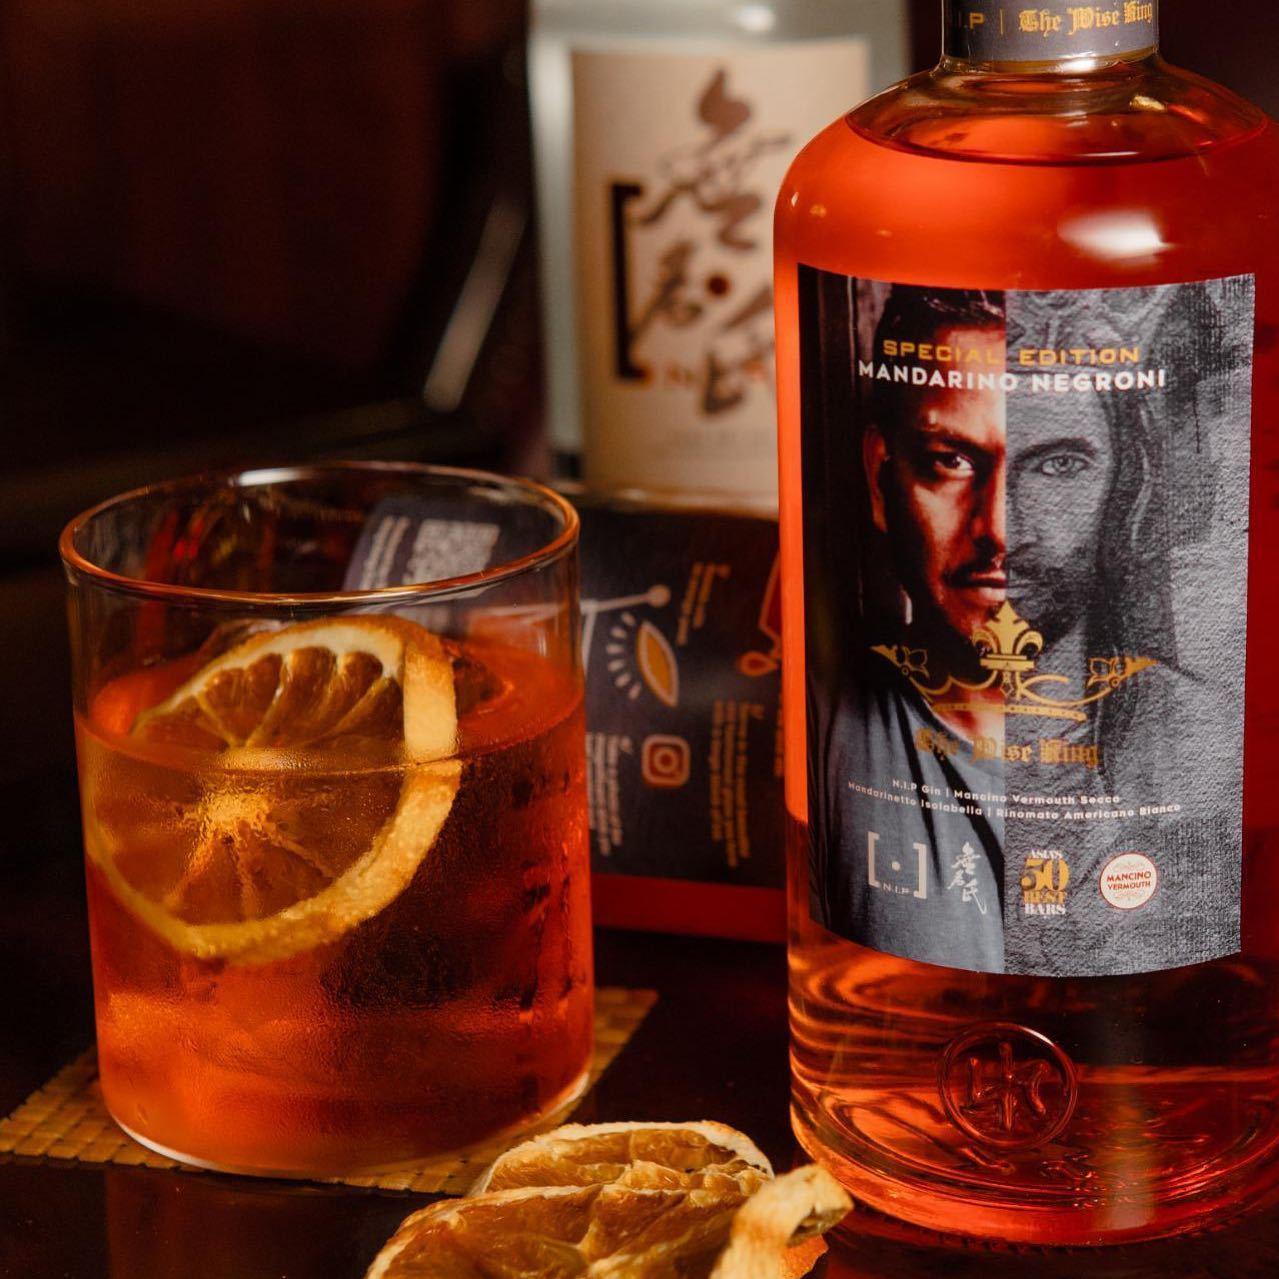 The Wise King Bottled Cocktail NIP Distilling